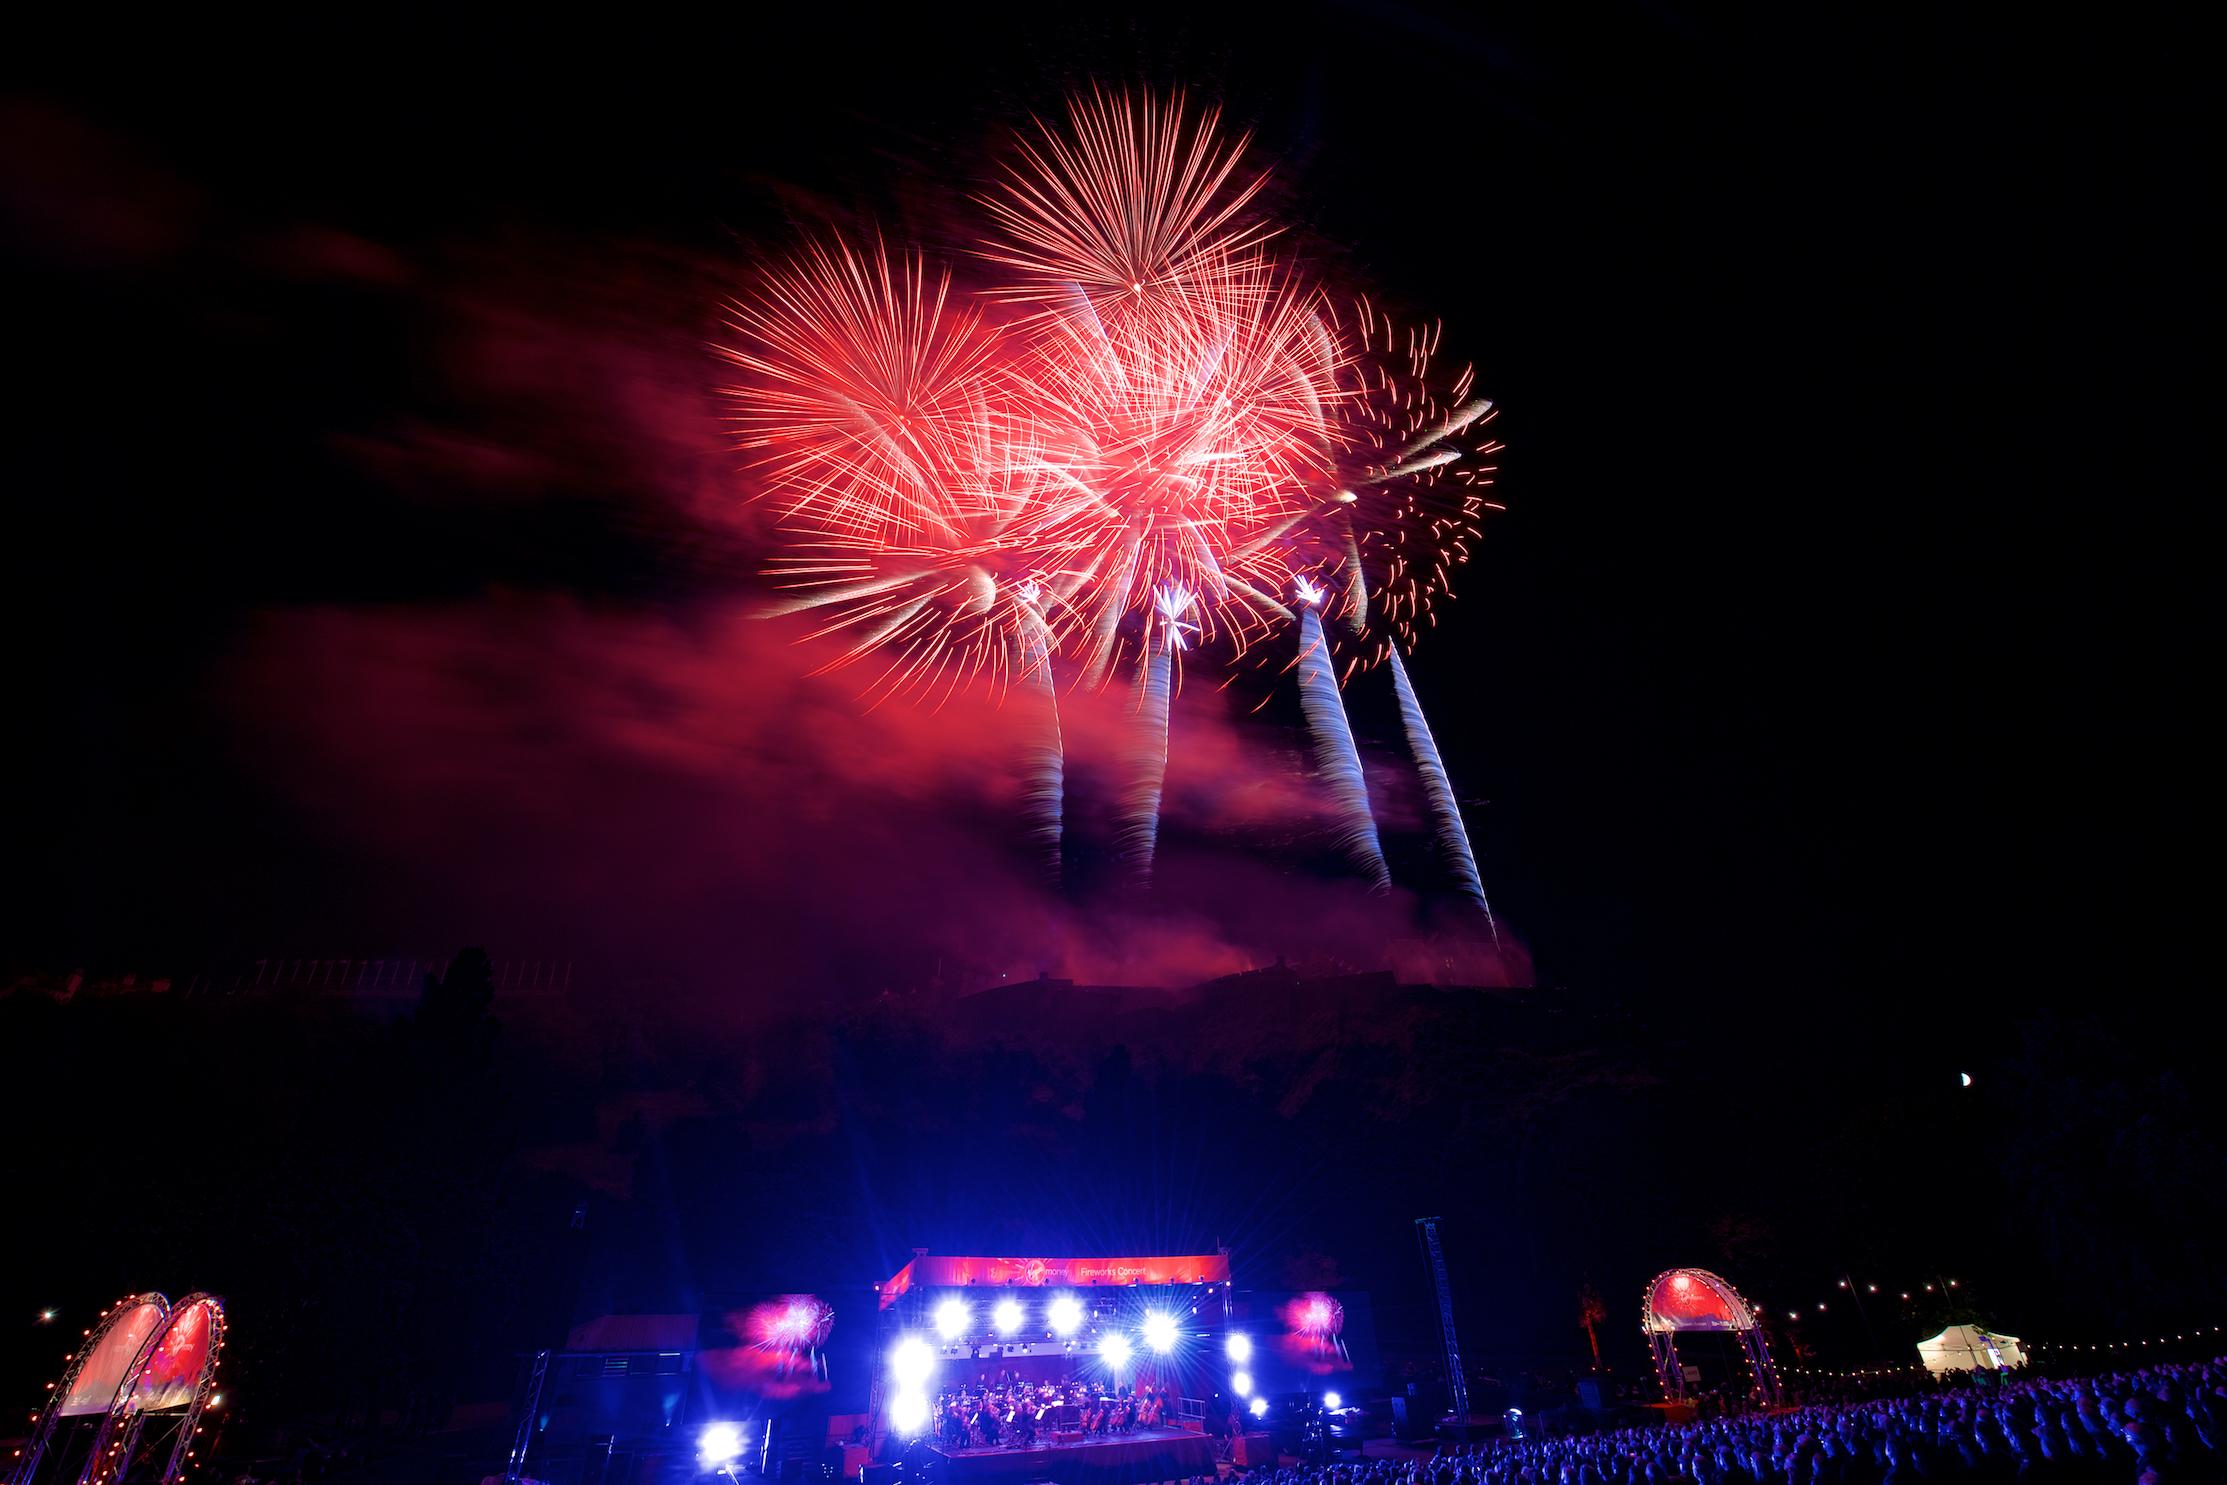 grand-finale-of-the-2017-international-festival-virgin-money-fireworks-concert-ross-bandstand-princes-street-gardens-edinburgh-uk-monday-28th-august-2017-6